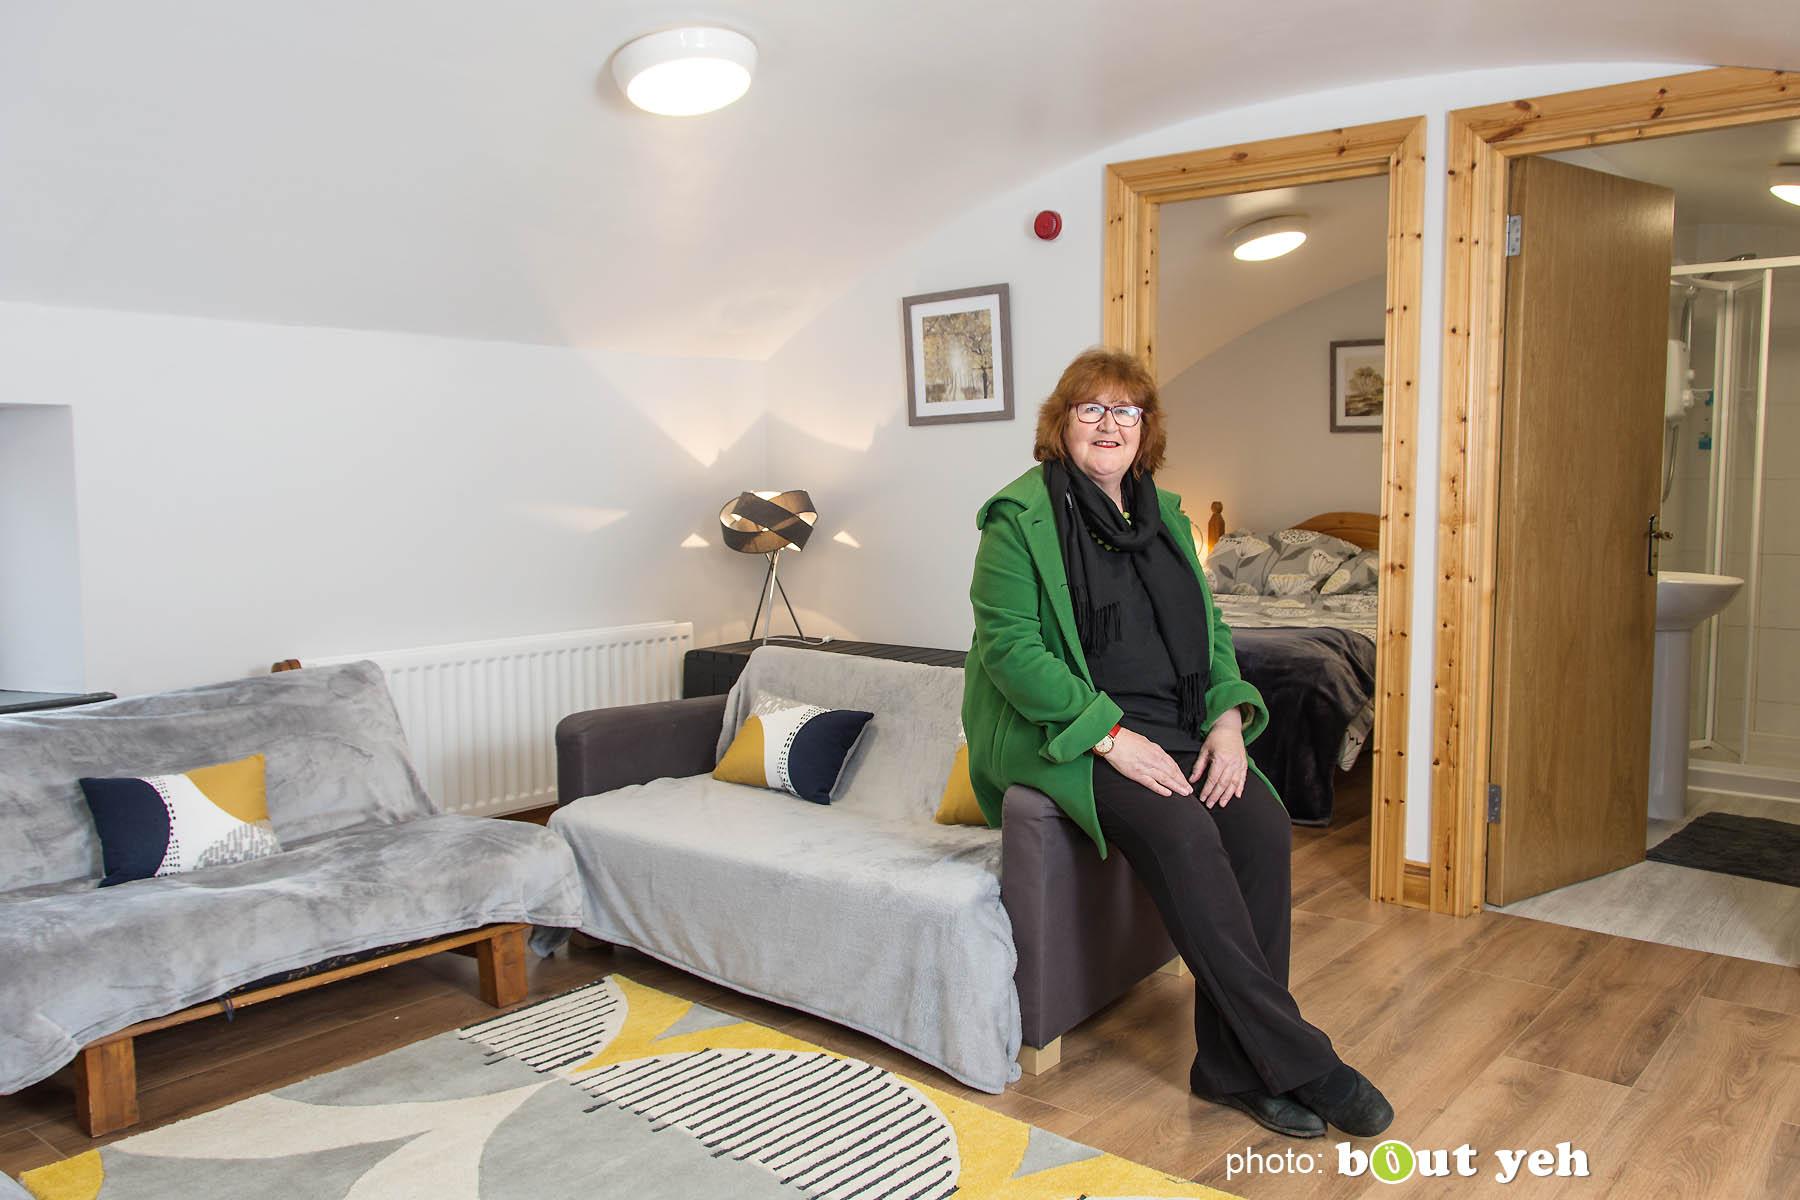 Liz Weir, Ballyeamon Barn Hostel, Glenariff, Northern Ireland - photo 1038.